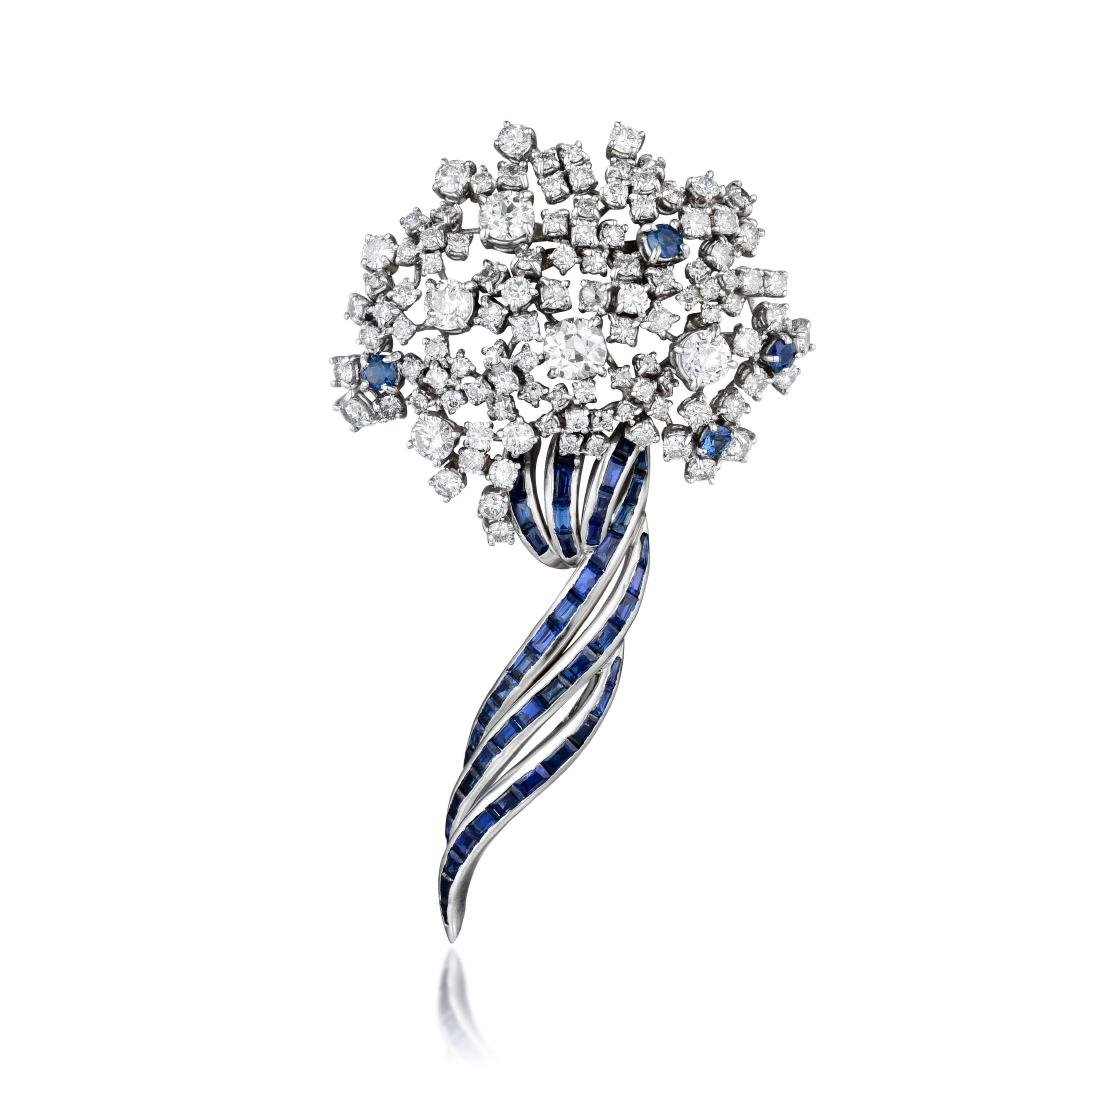 A Diamond and Sapphire Platinum Brooch